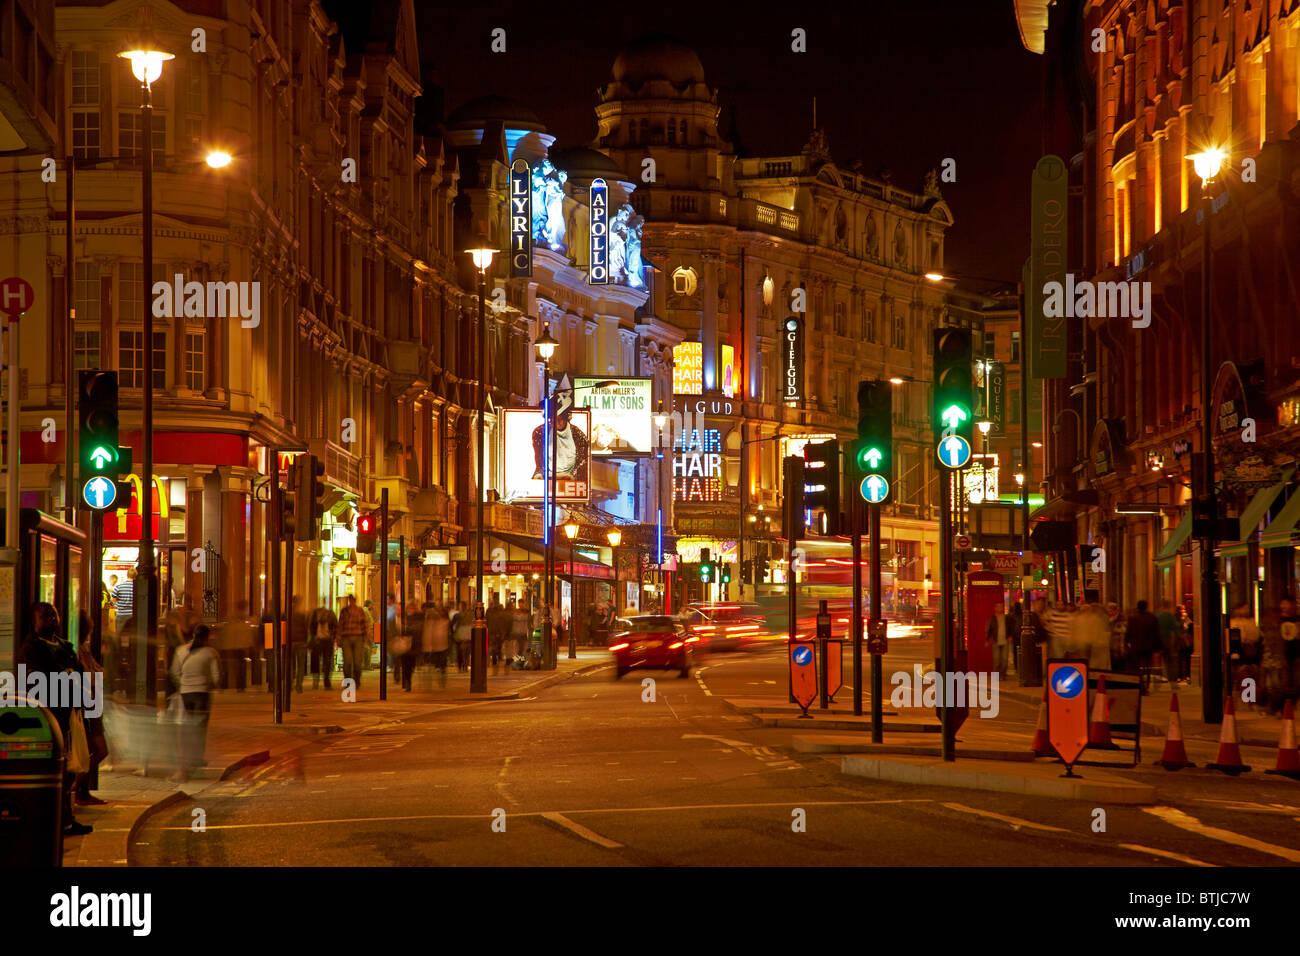 West End Theatres (Lyric, Apollo, and Gielgud), Shaftesbury Avenue, Soho, London, England, United Kingdom - Stock Image